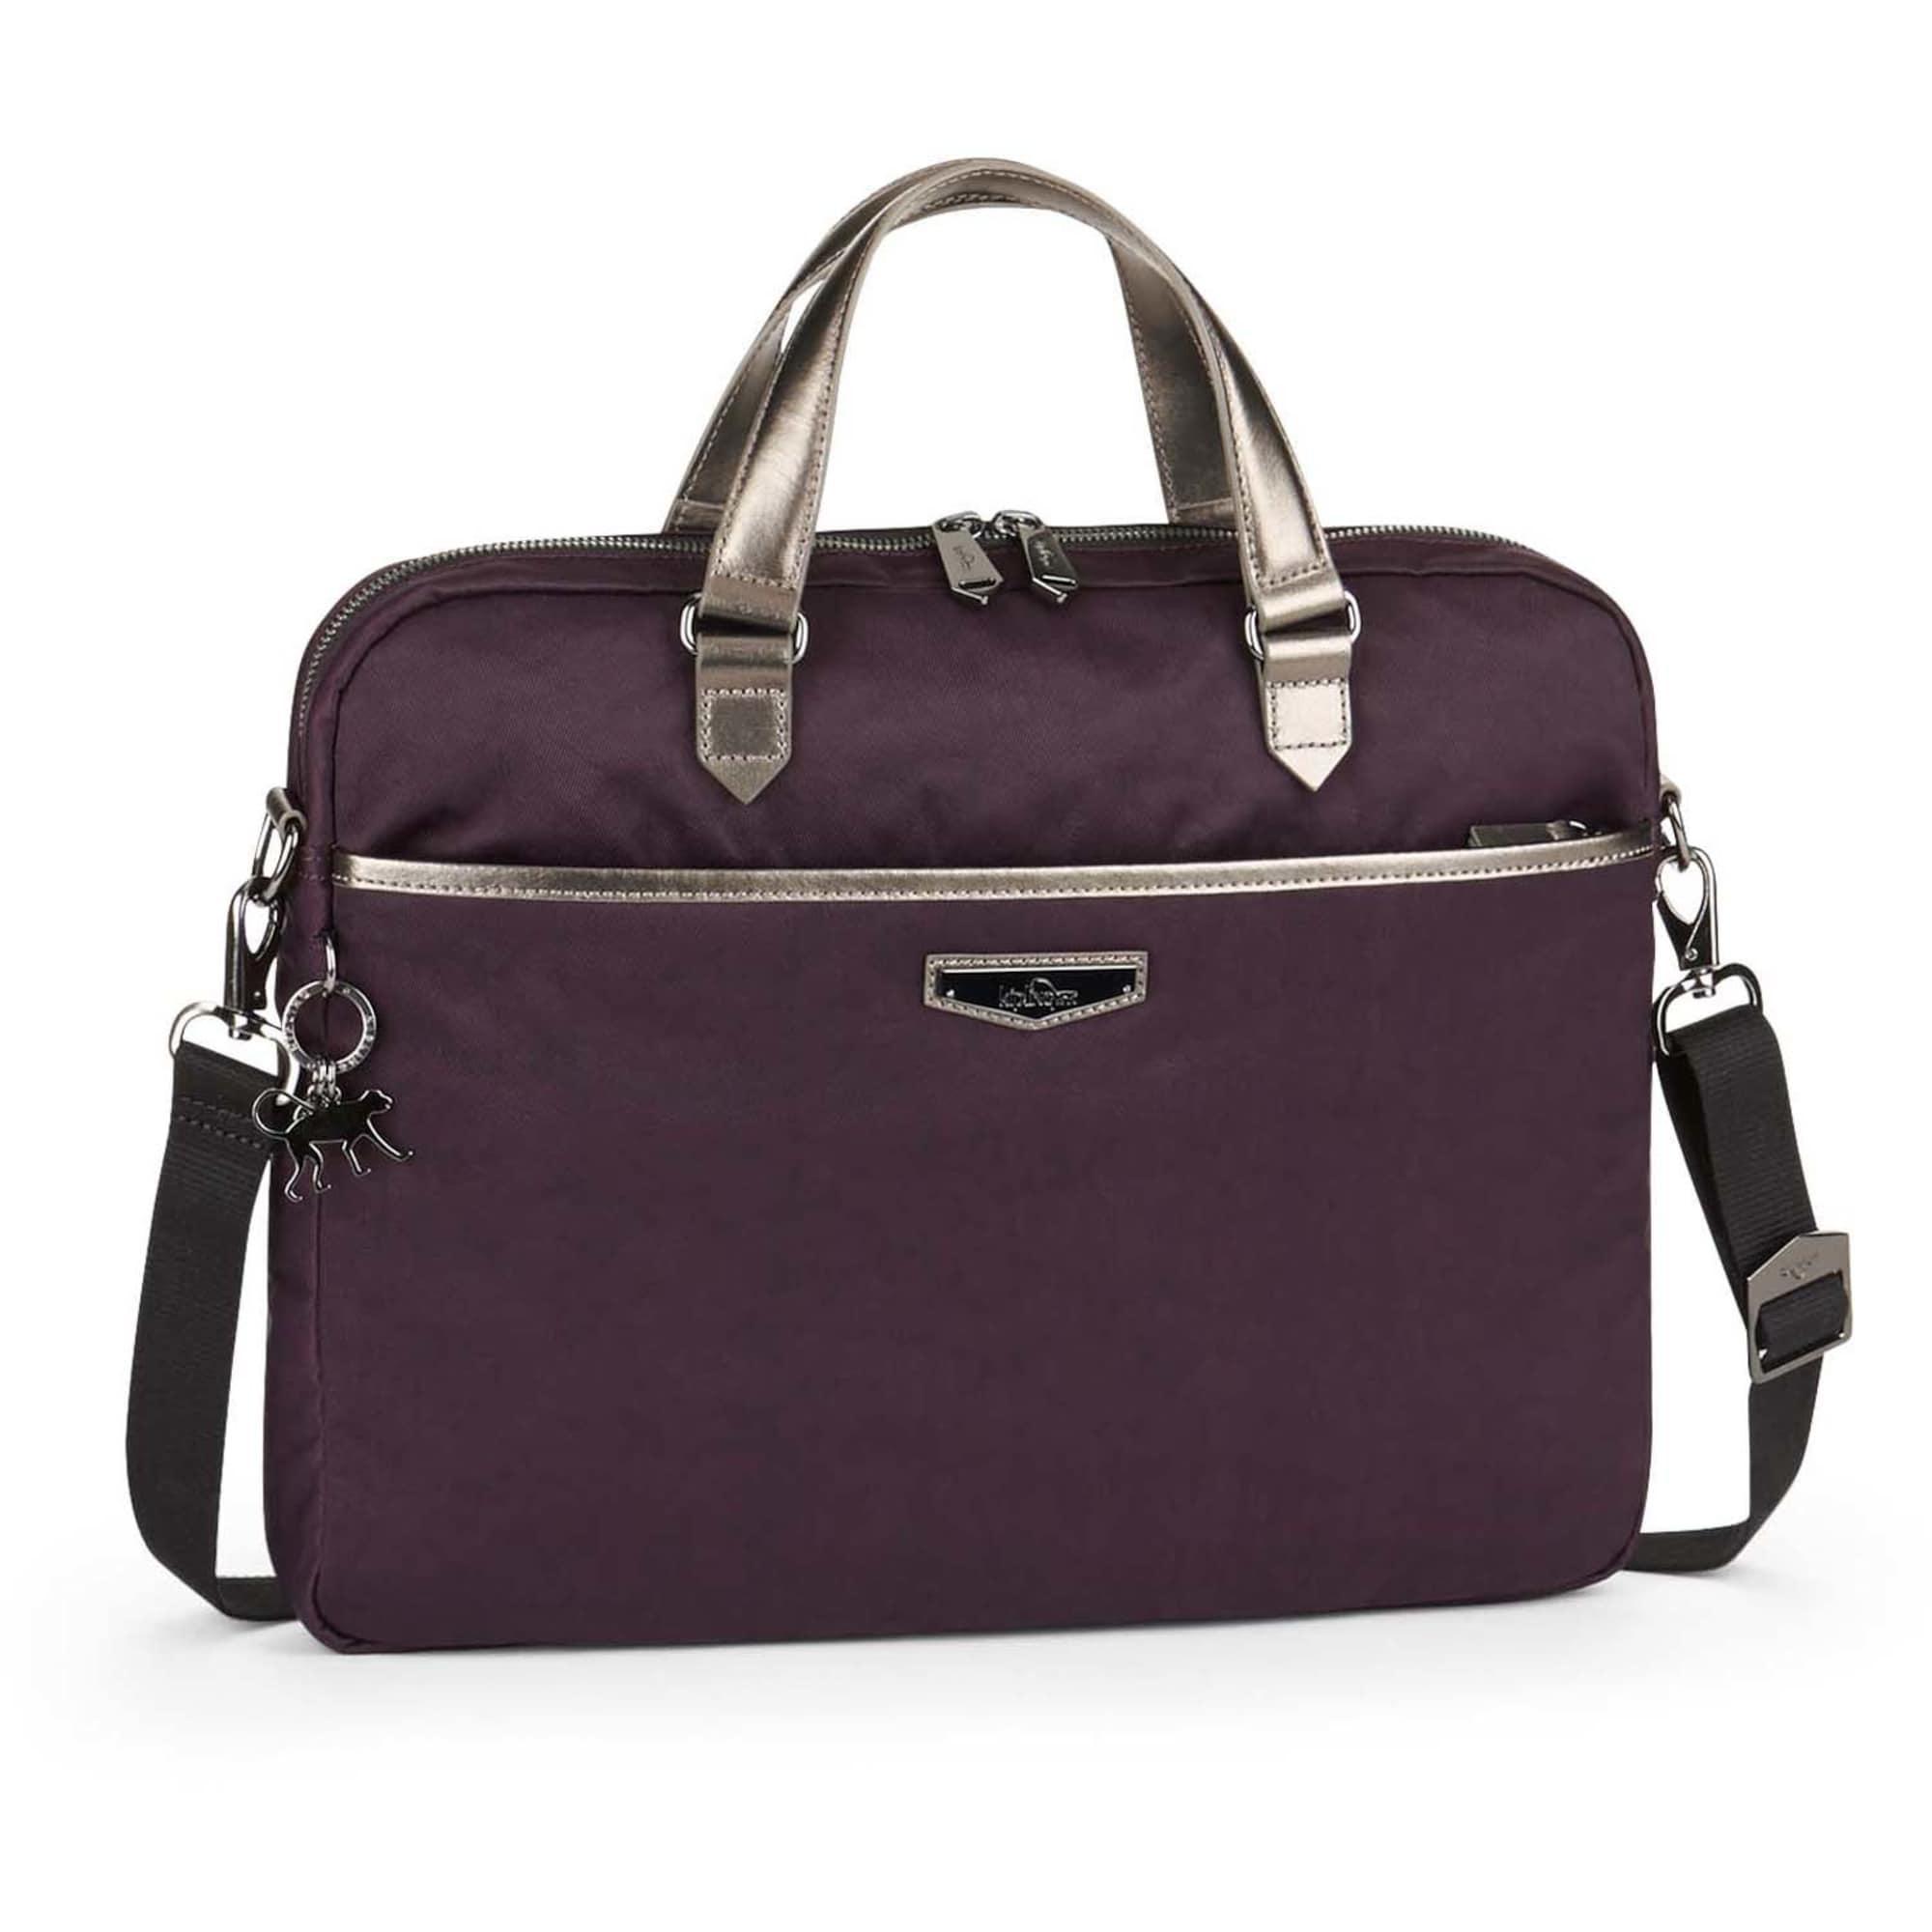 City Kaitlyn Laptoptasche 39 cm | Taschen > Business Taschen | Gold - Bordeaux | KIPLING